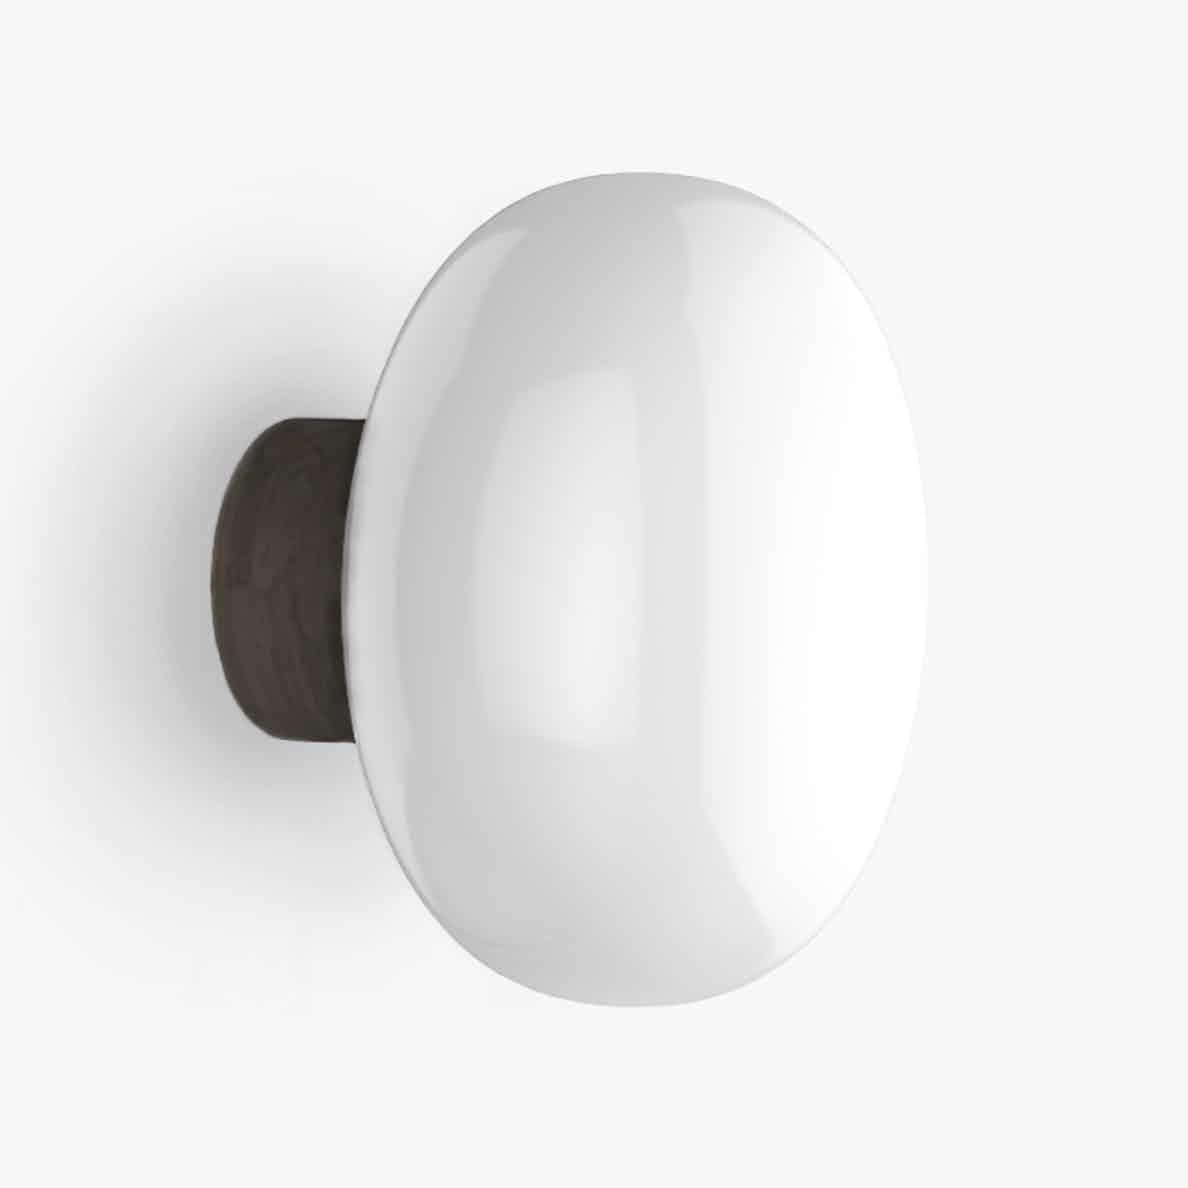 New works karl johan wall lamp smoked white haute living